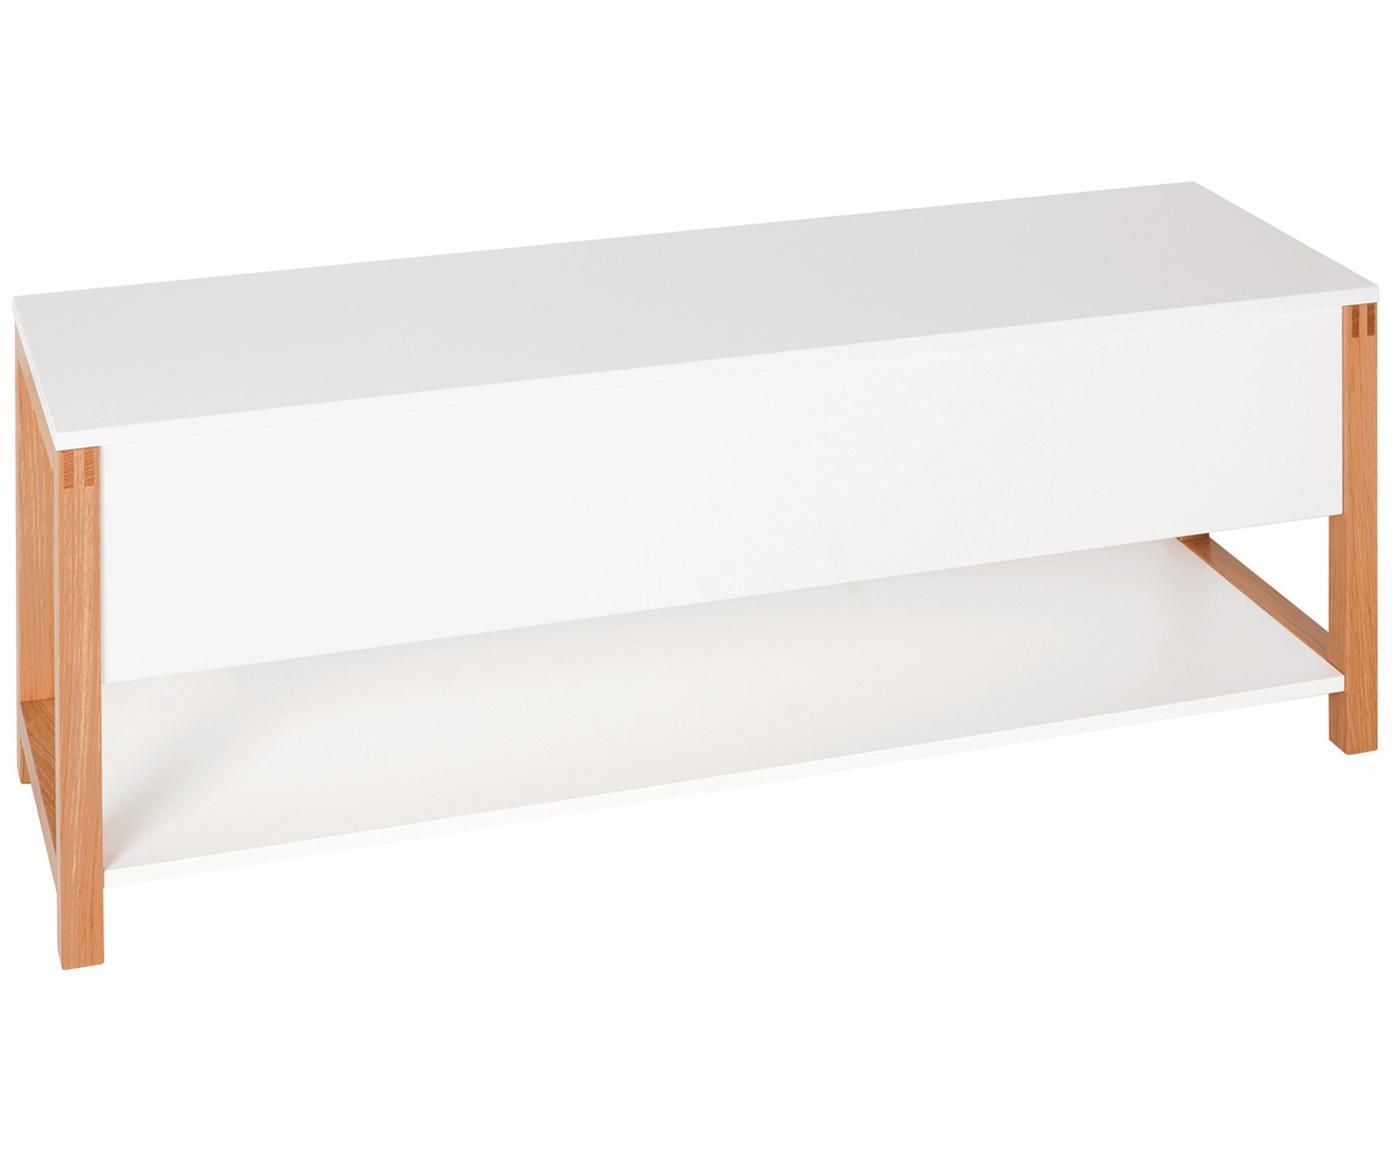 Banco Northgate Flip, Patas: madera de roble, Blanco, An 120 x Al 48 cm